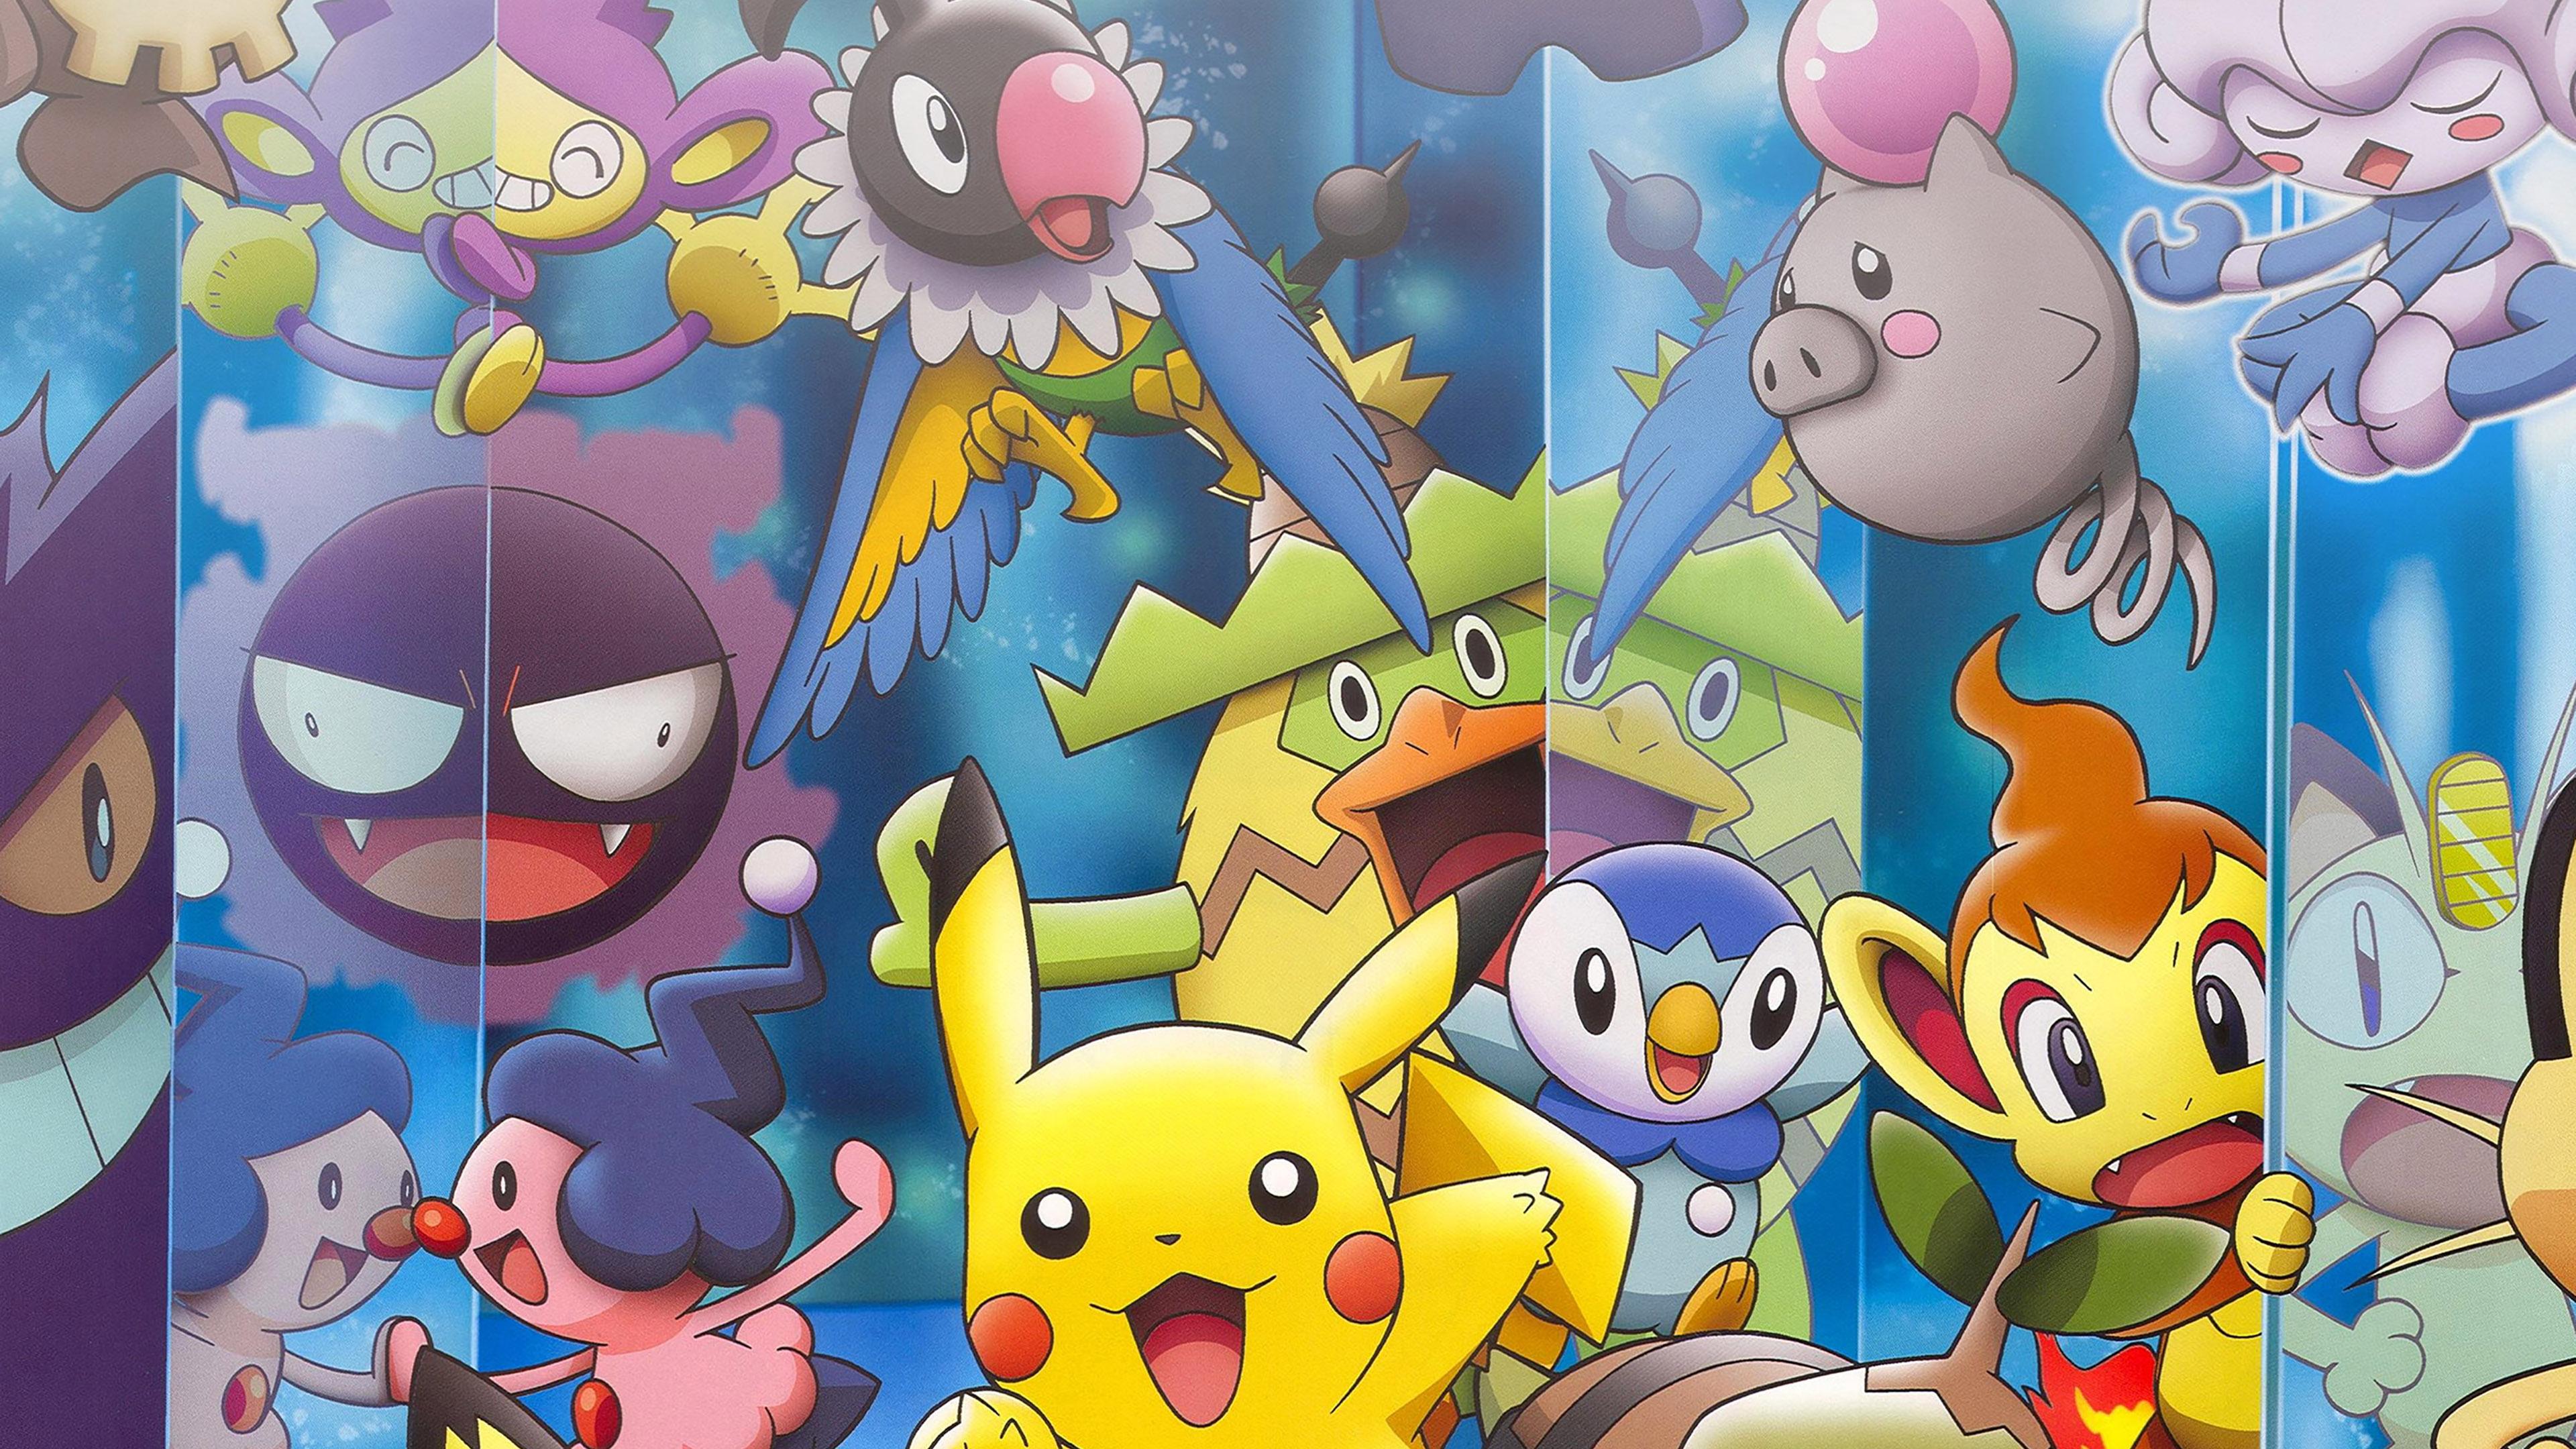 Image Result For Anime Wallpaper Hd X Pokemon